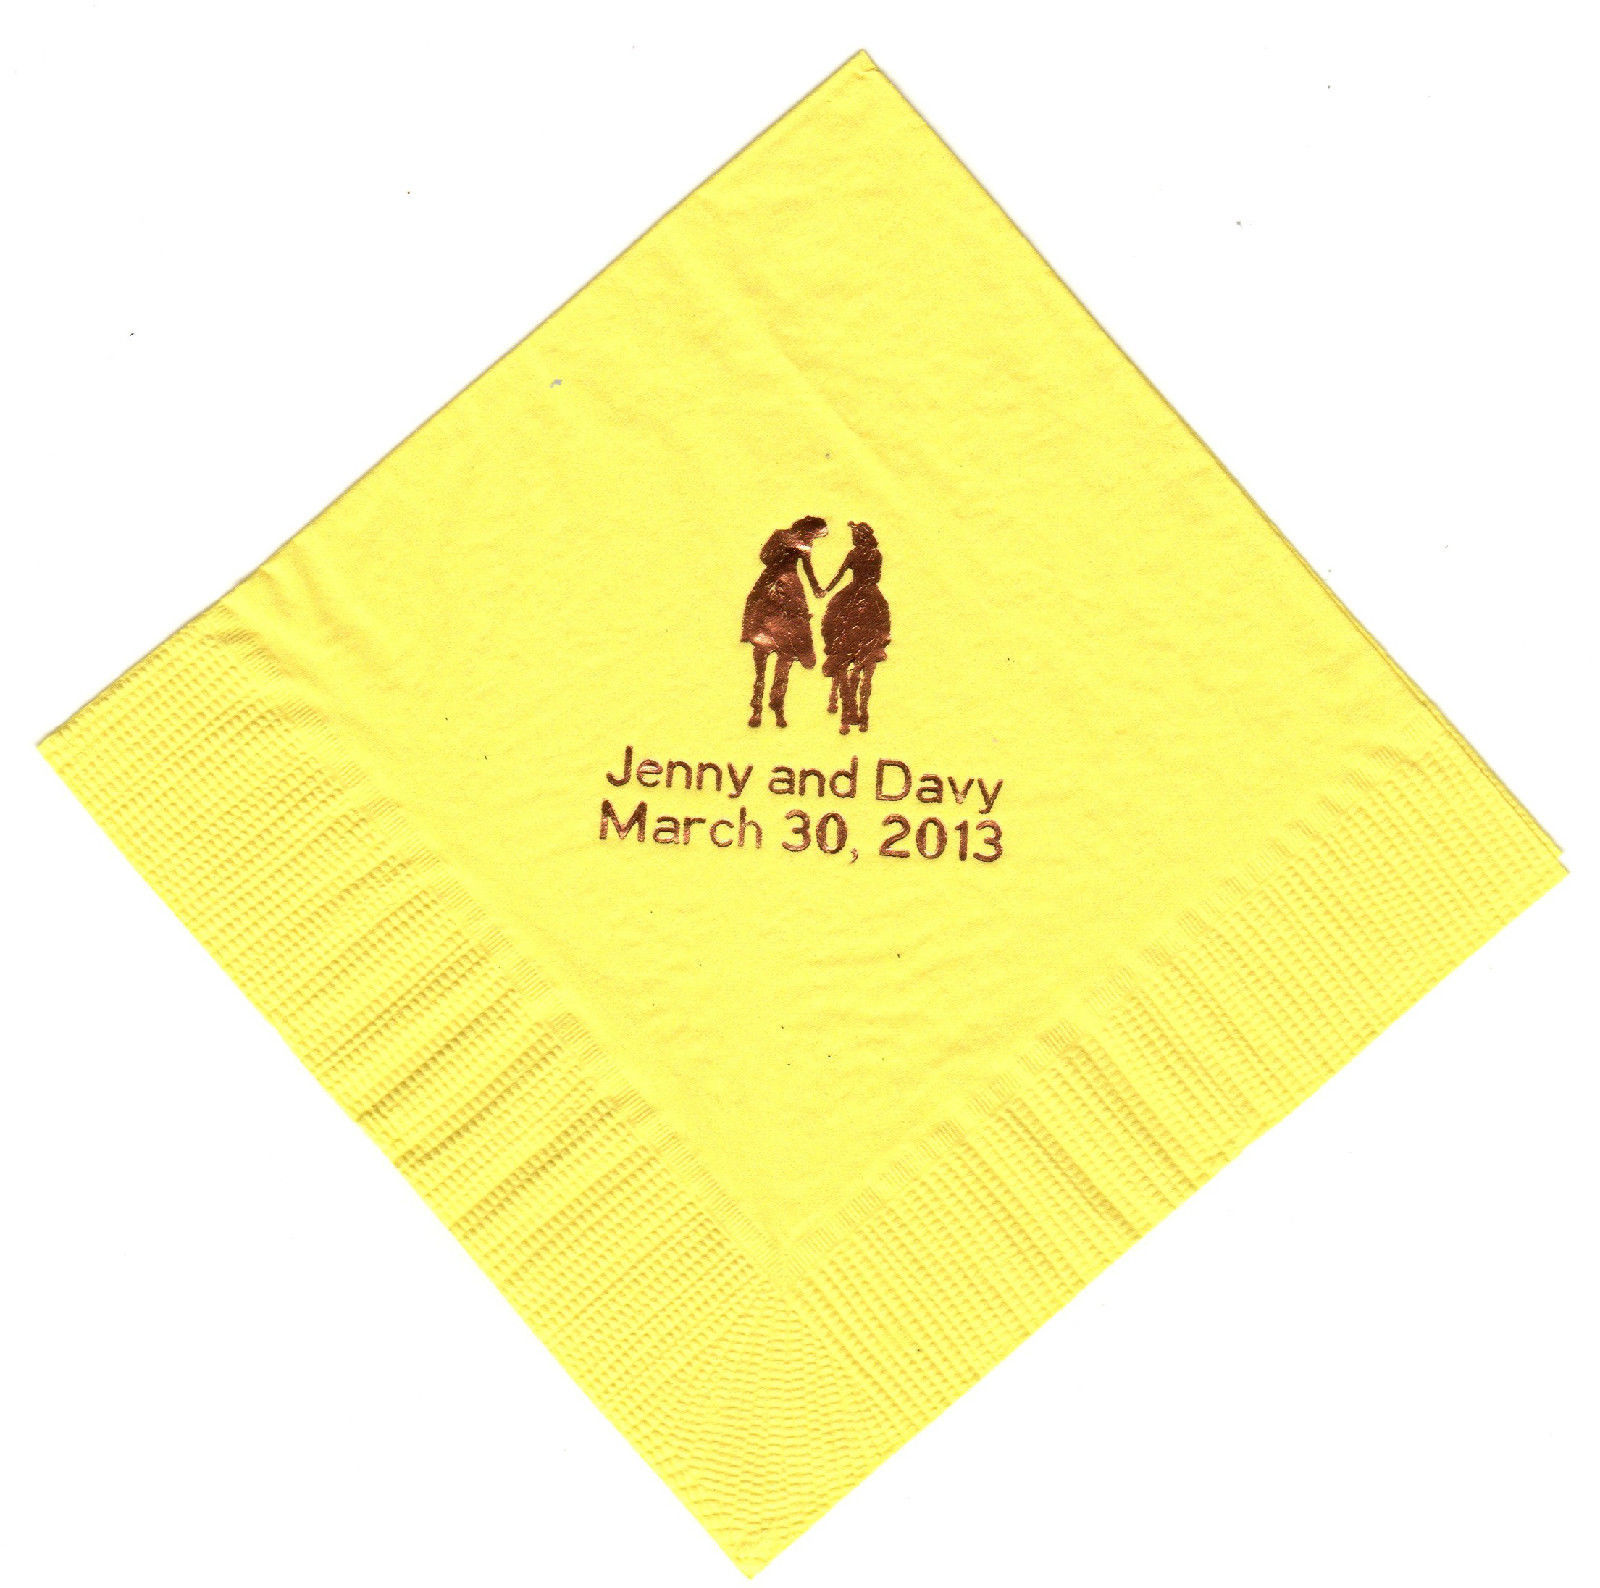 WESTERN ROMANCE LOGO 50 Personalized LUNCHEON DINNER beverage napkins